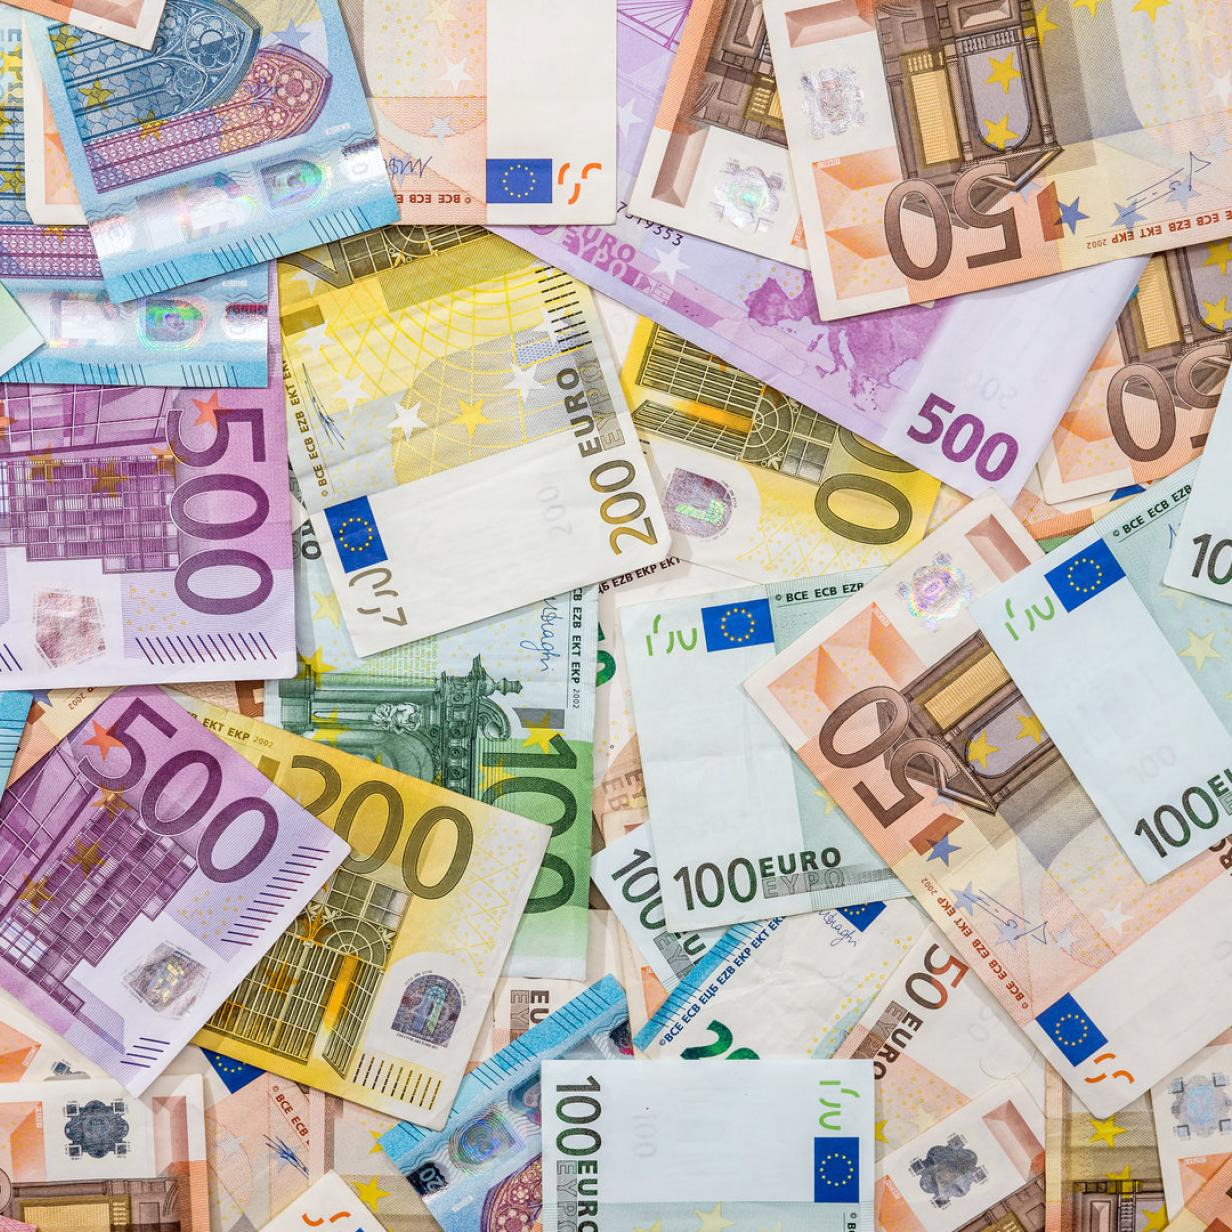 Parlament als Casino? Pensionsplus und Steuerreform beschlossen